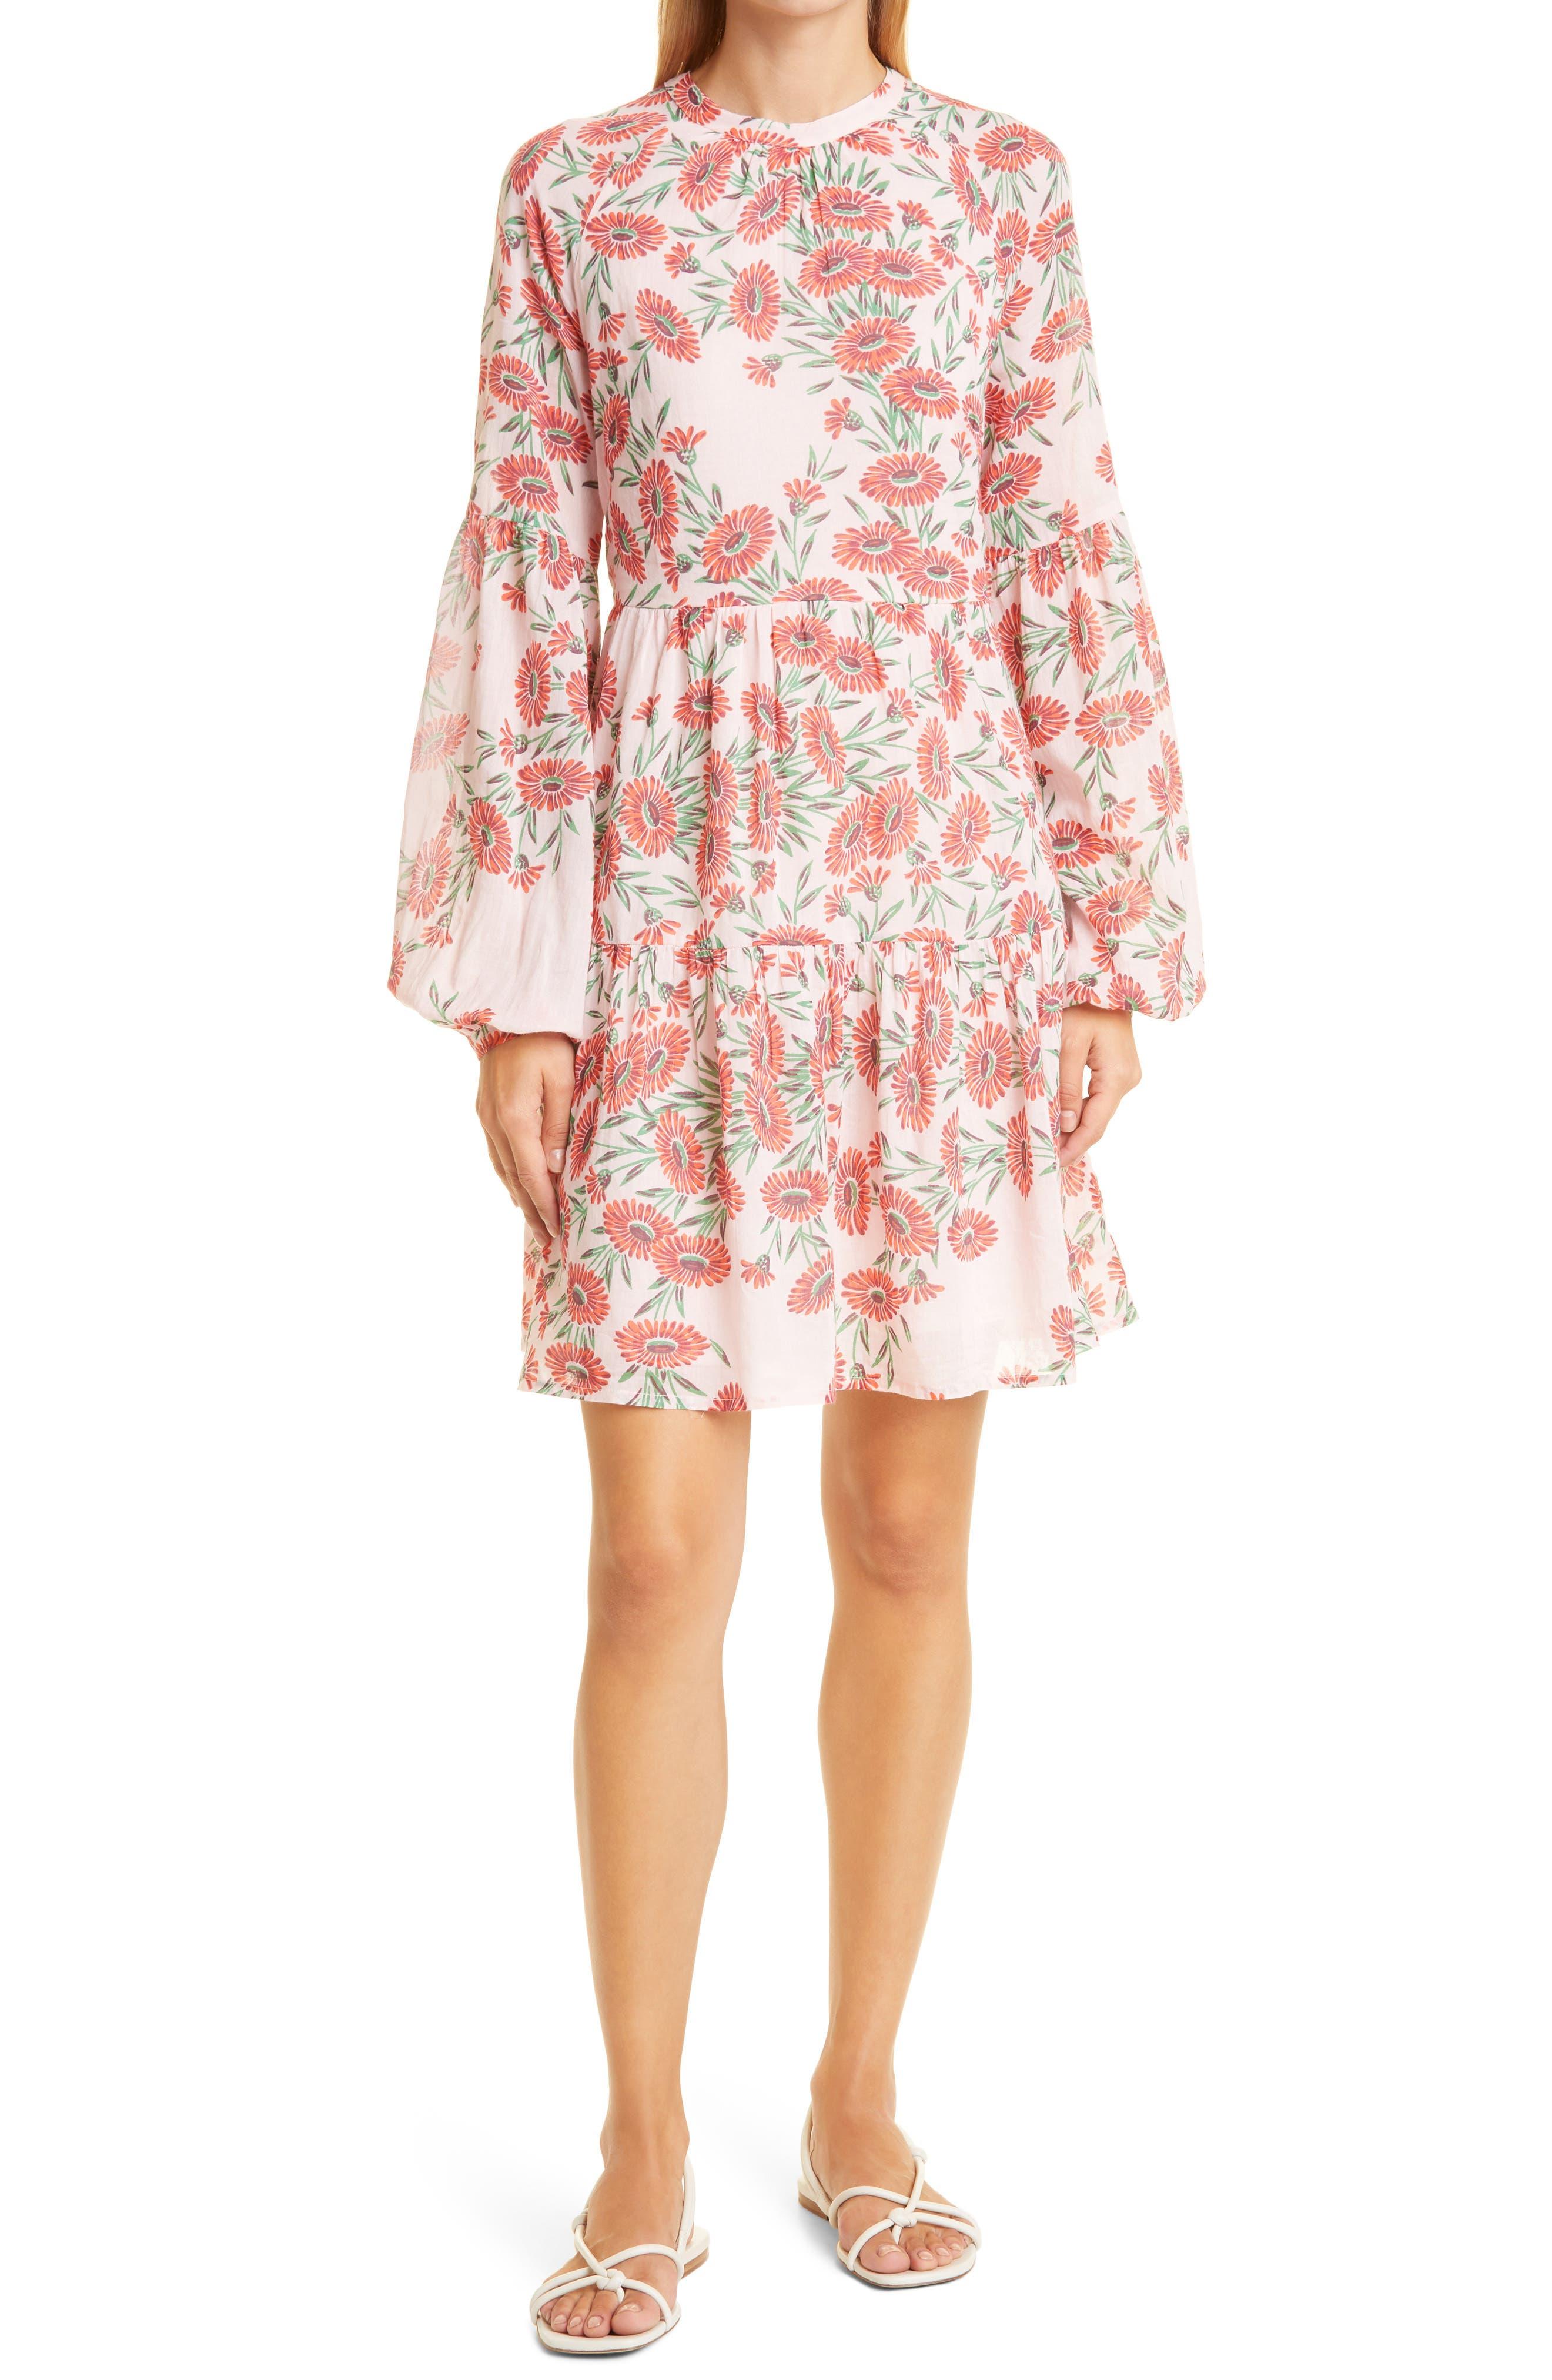 Lorene Floral Fit & Flare Long Sleeve Organic Cotton Dress